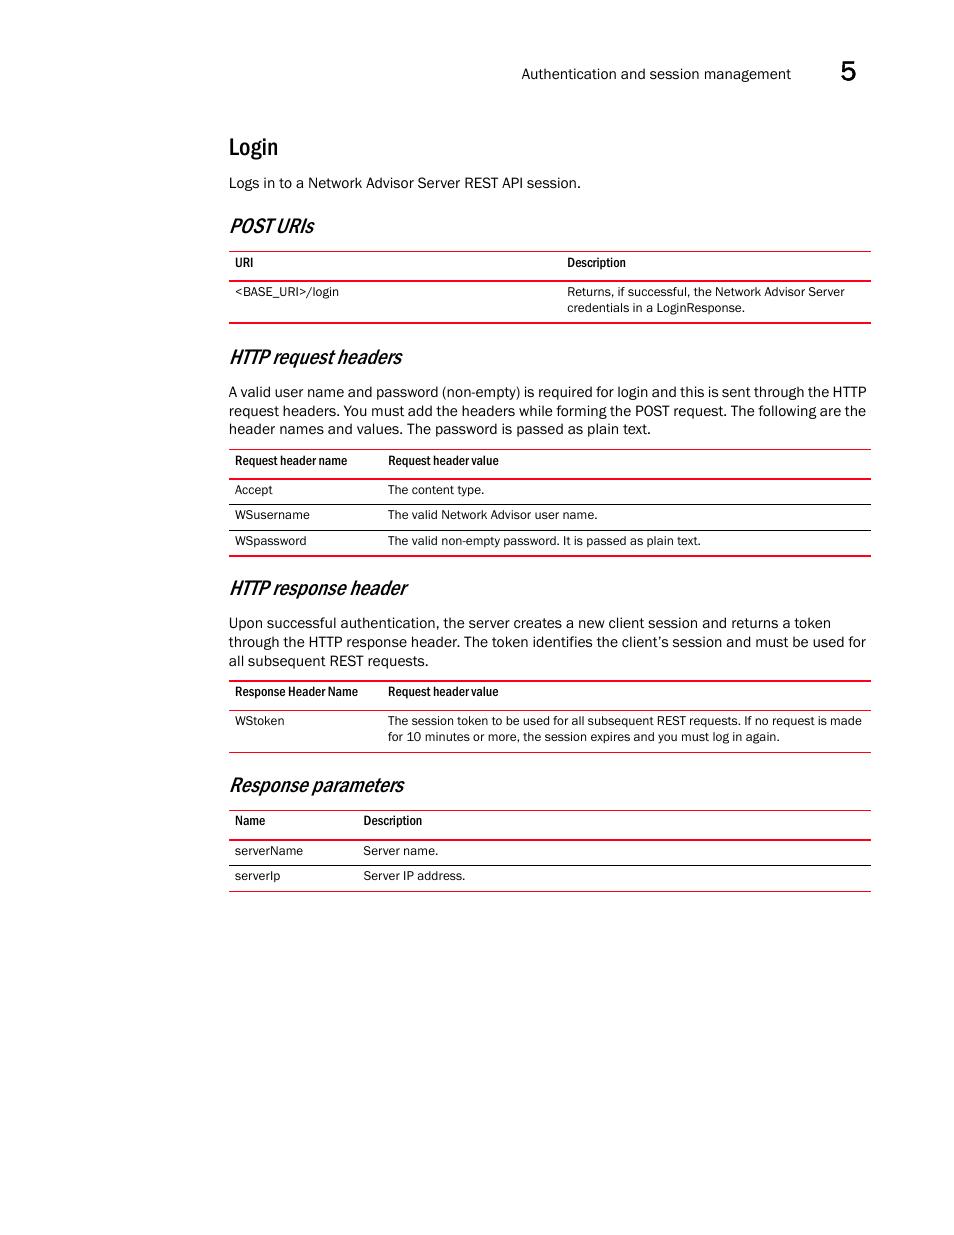 Login, Response parameters   Brocade Network Advisor REST API Guide